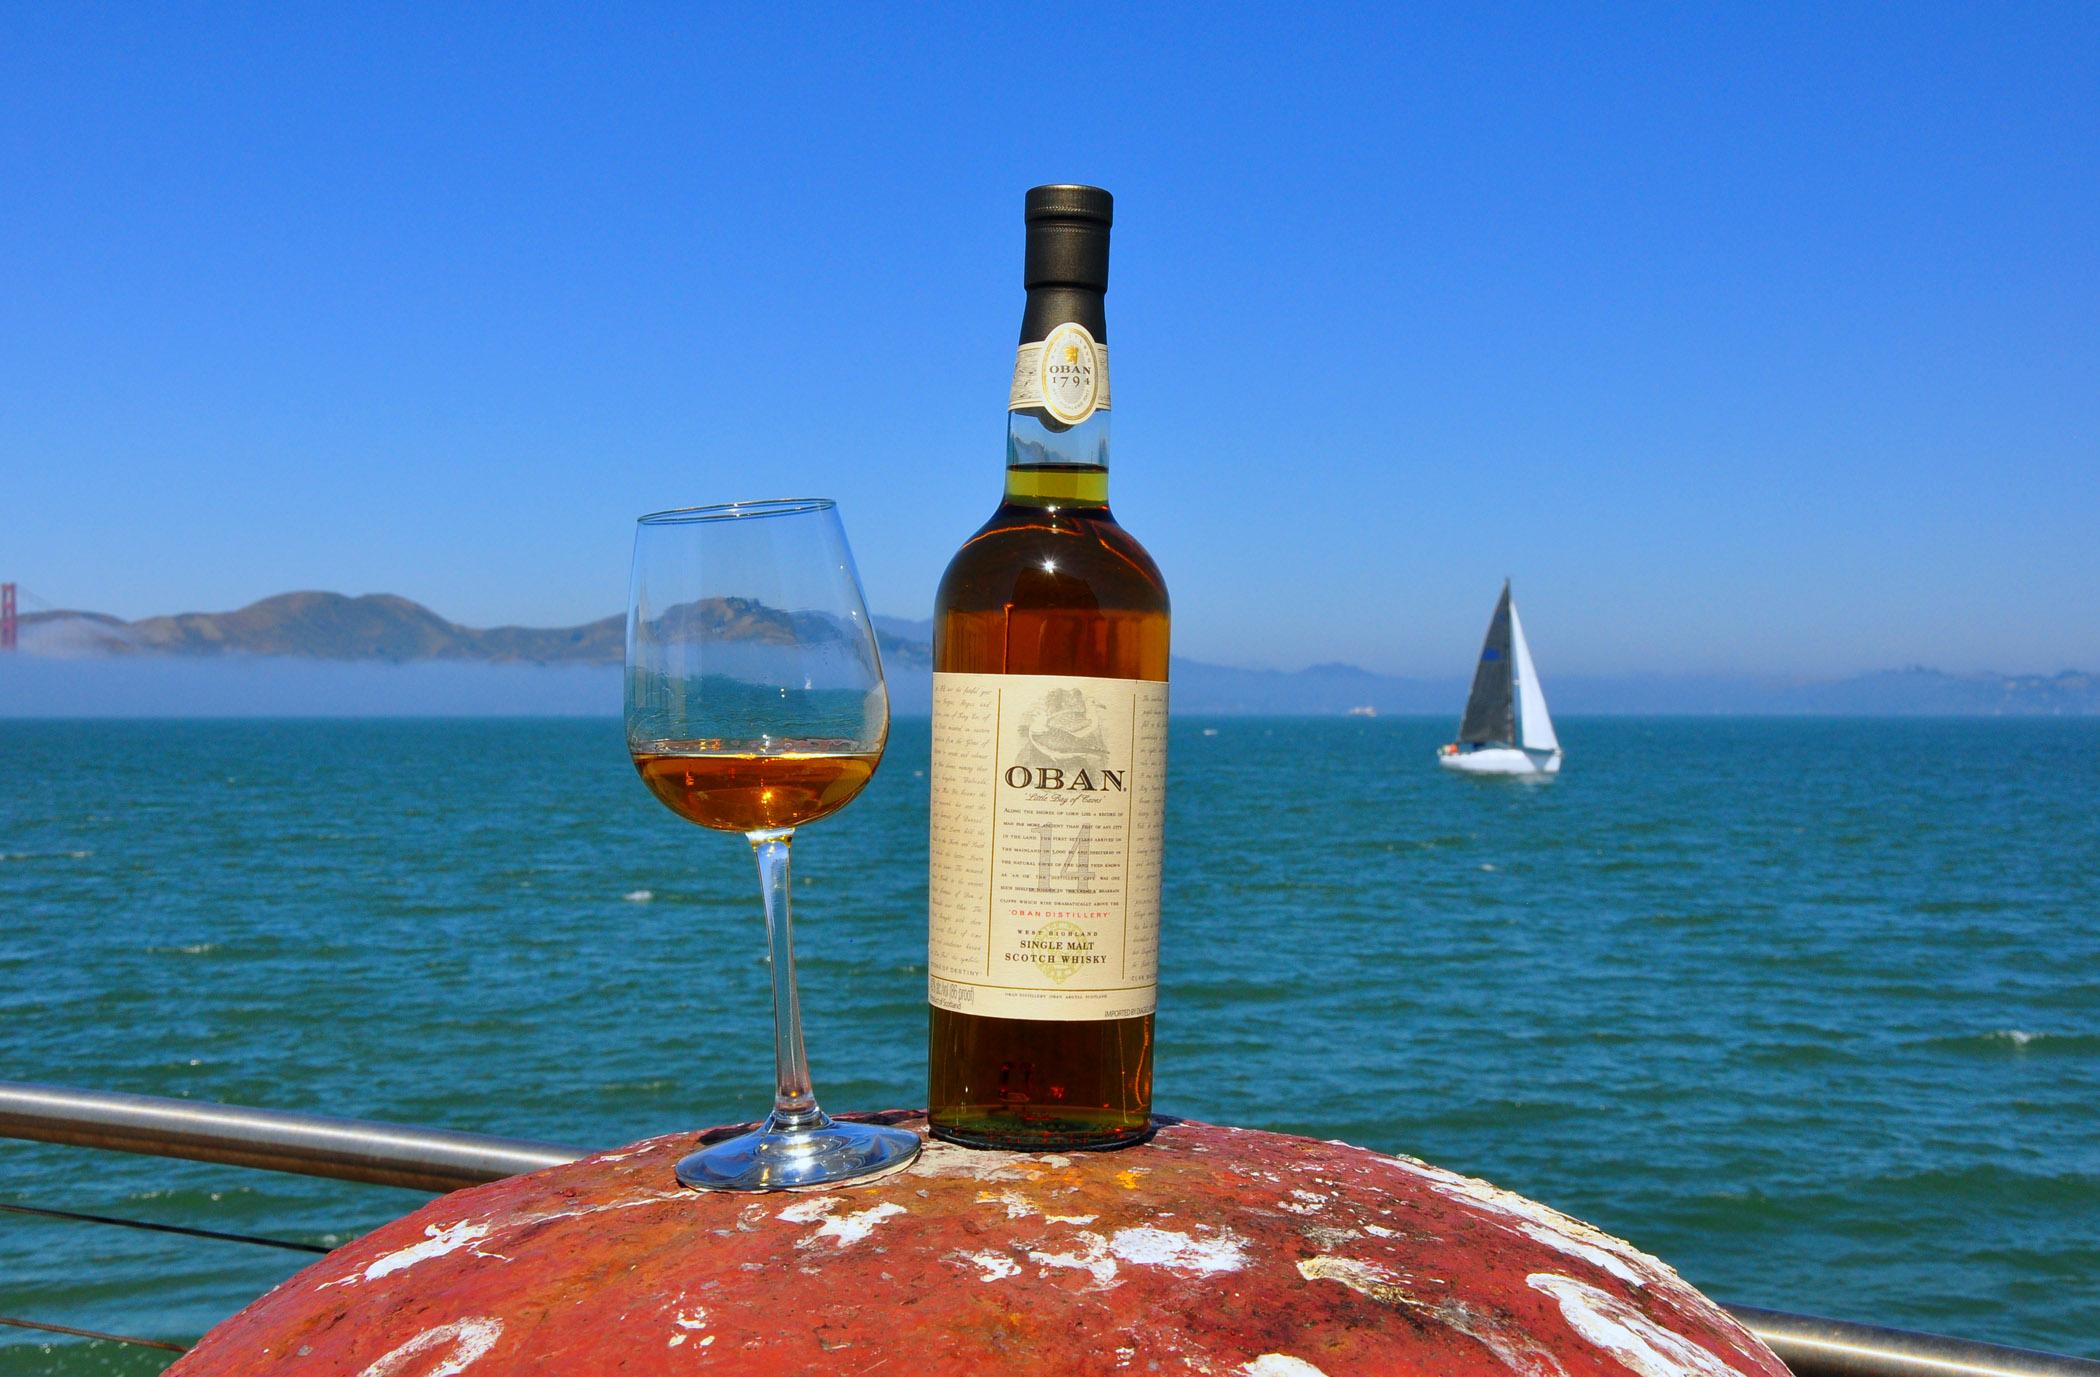 3. Oban Whisky